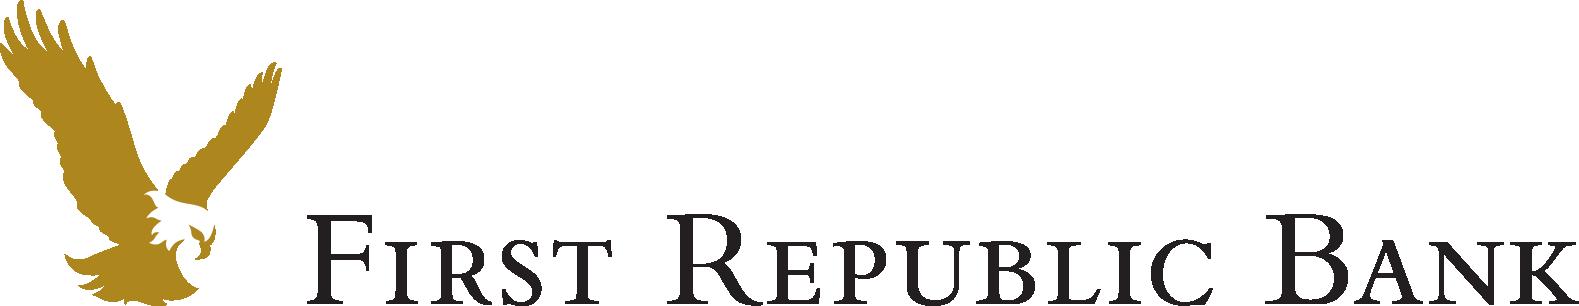 FRB Logo Flush Left-White Background-Print.png